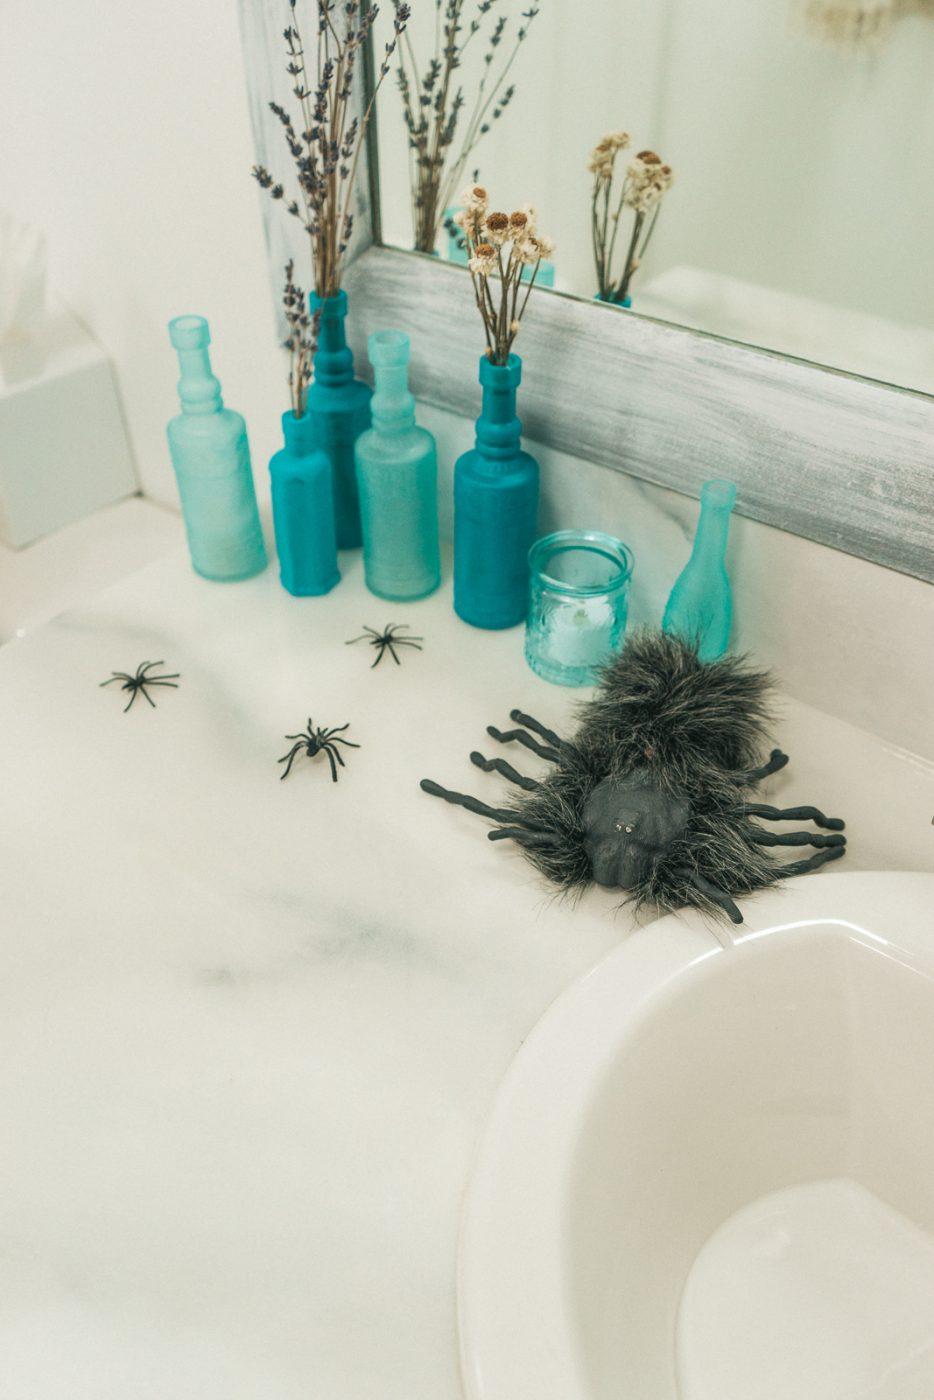 Spiders in bathroom